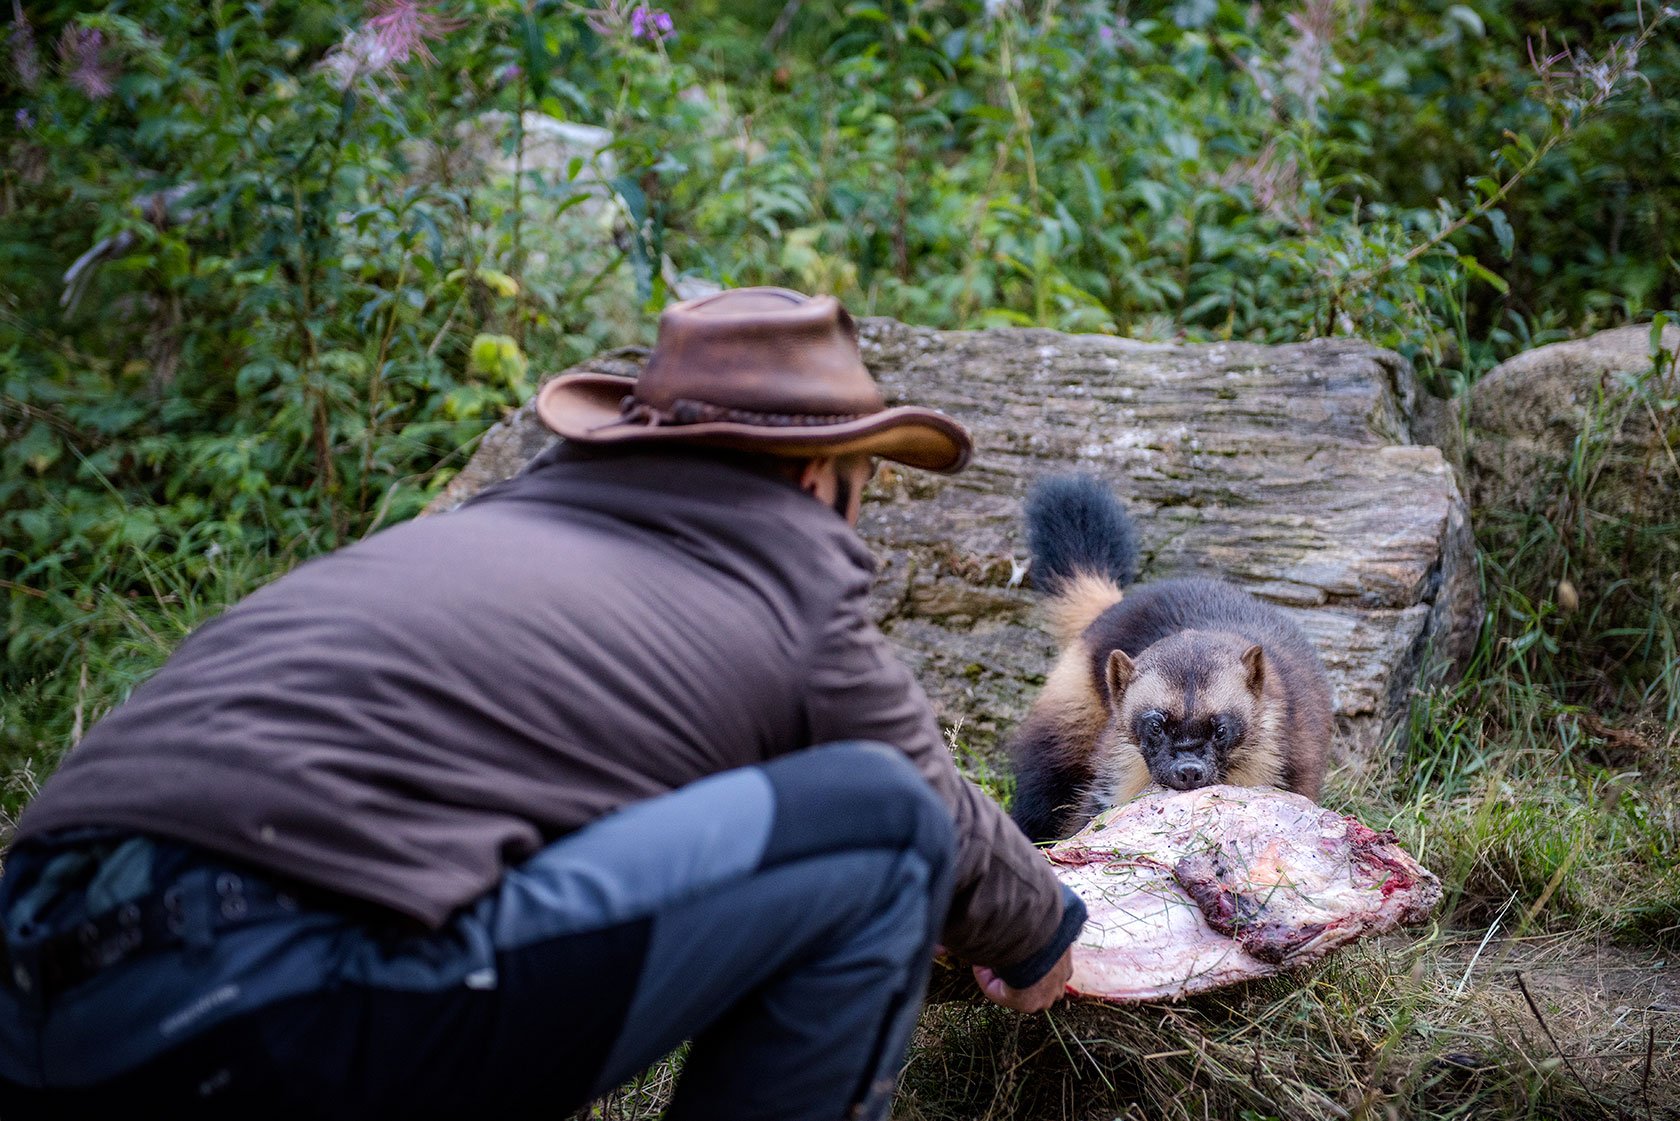 austin-trigg-brave-wilderness-alaska-BW-Coyote-Plays-TugOWar-DSC_5169-web.jpg